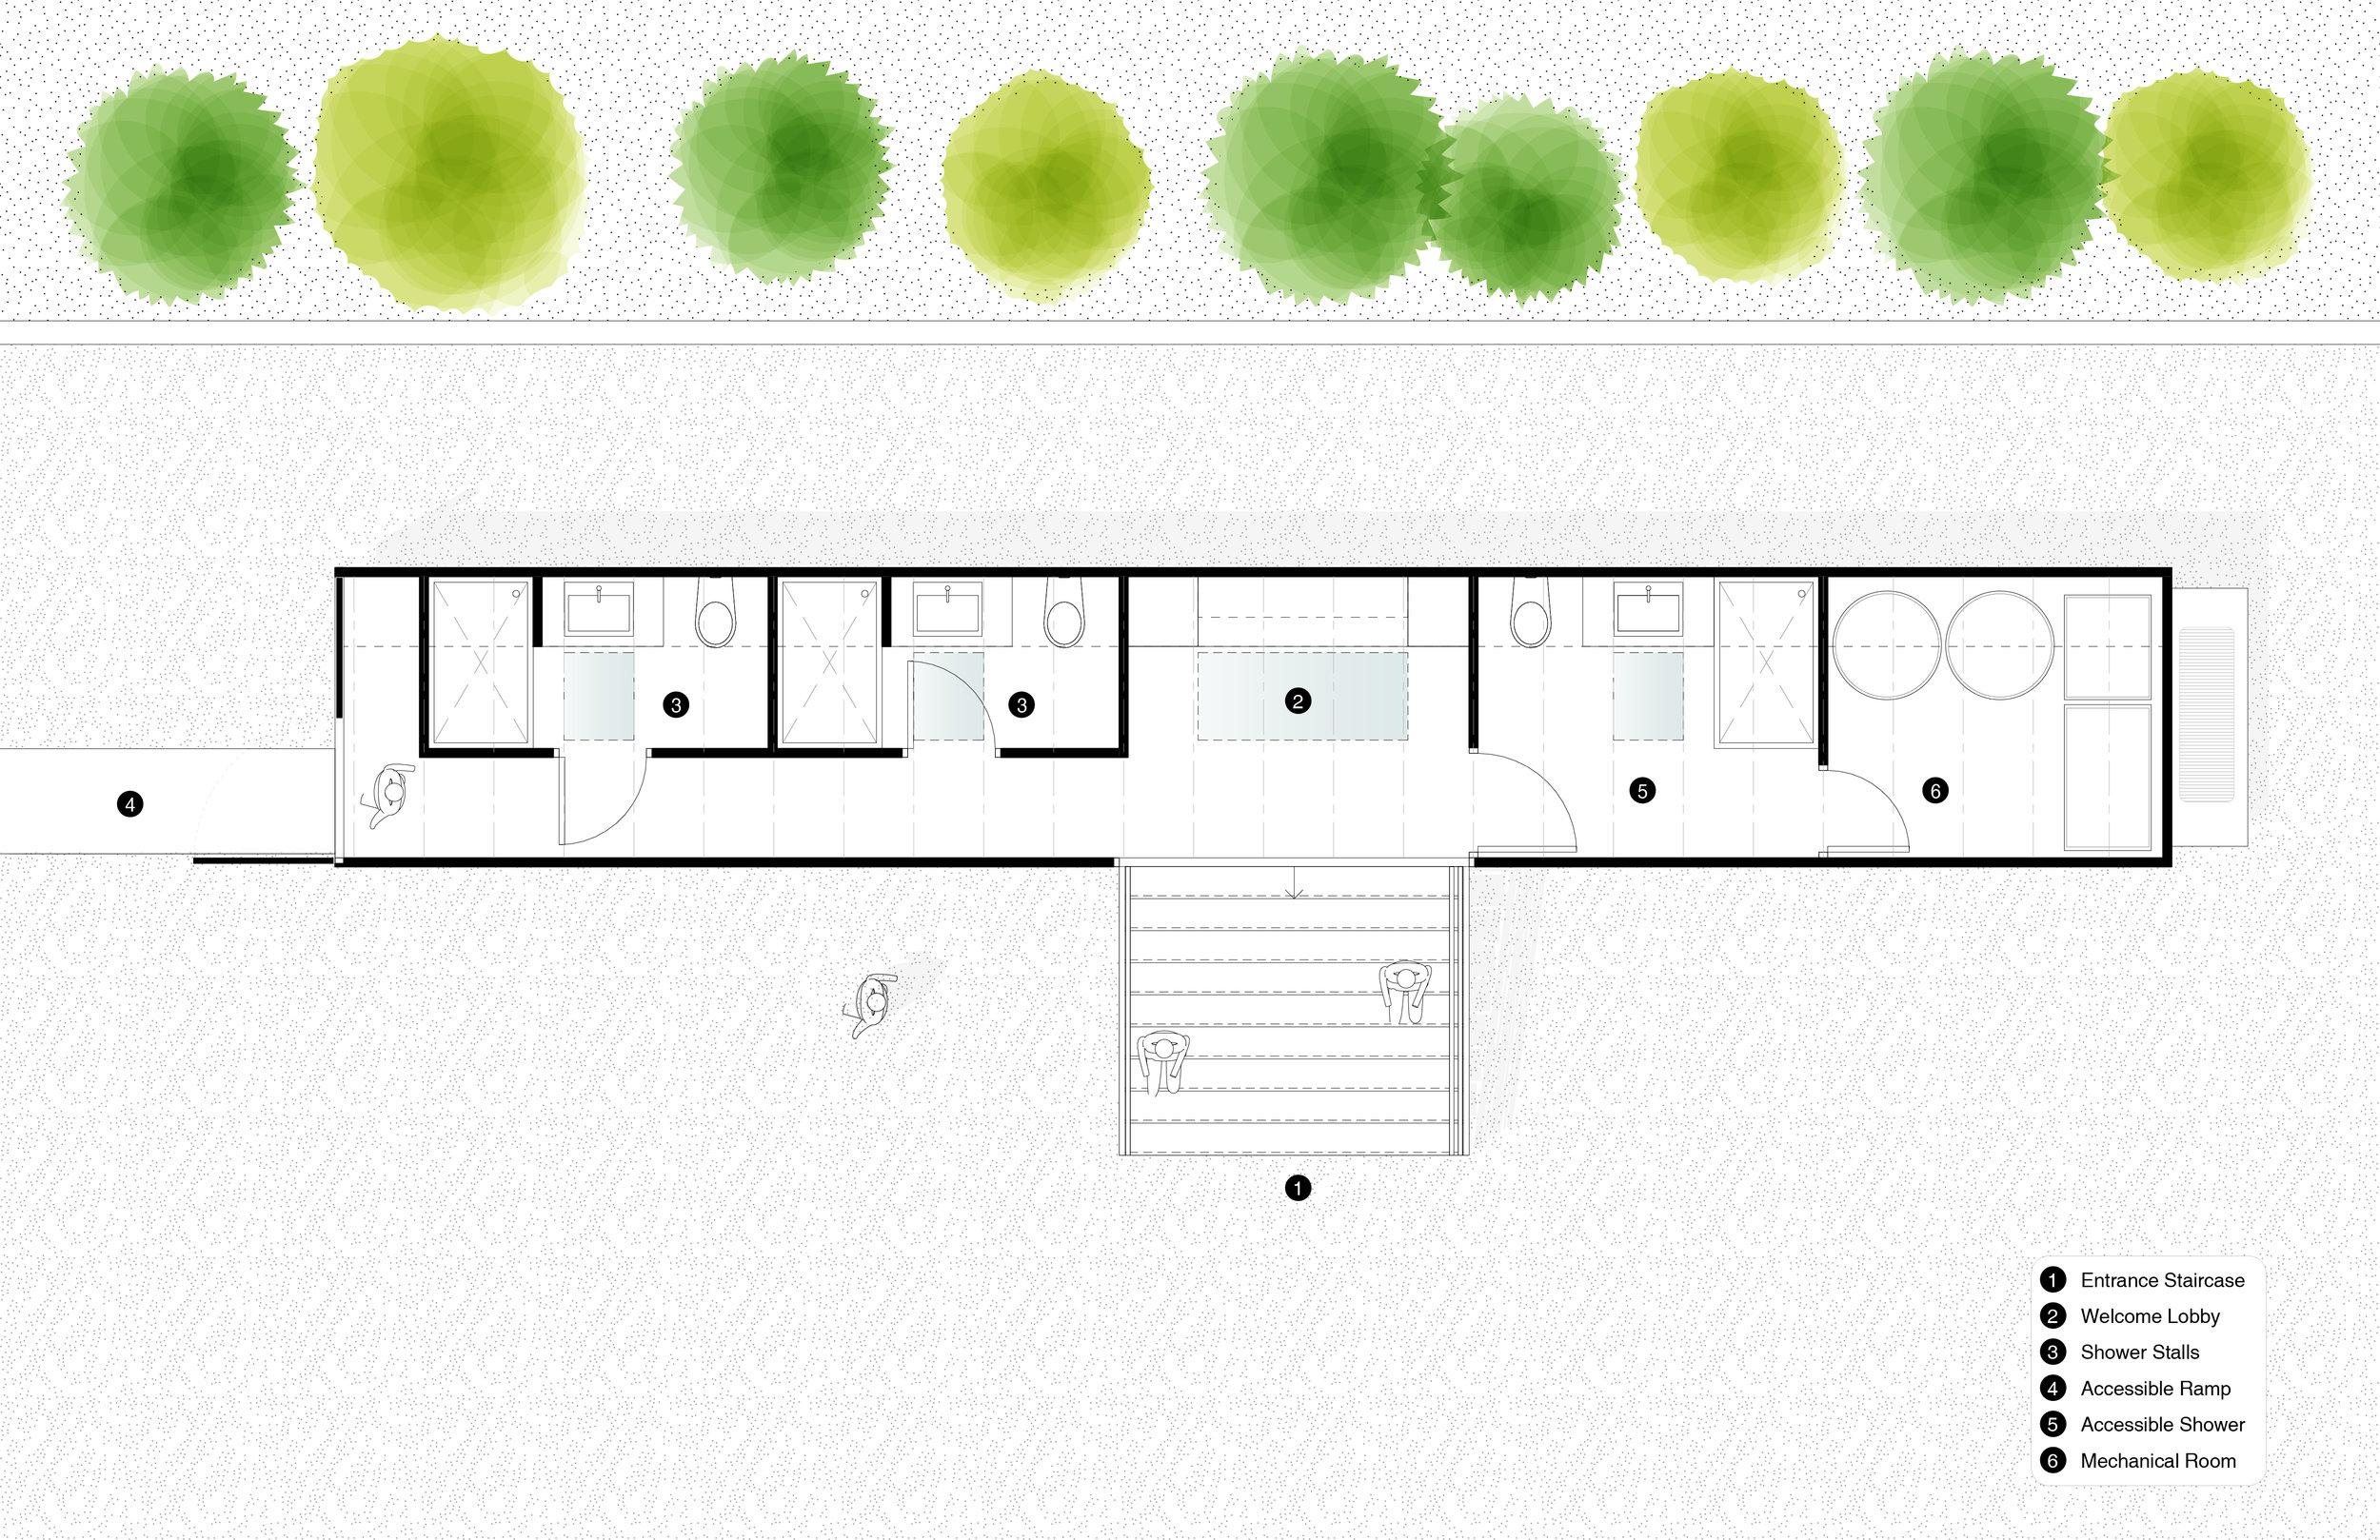 MobileShowers_Floor Plan-01-01.jpg